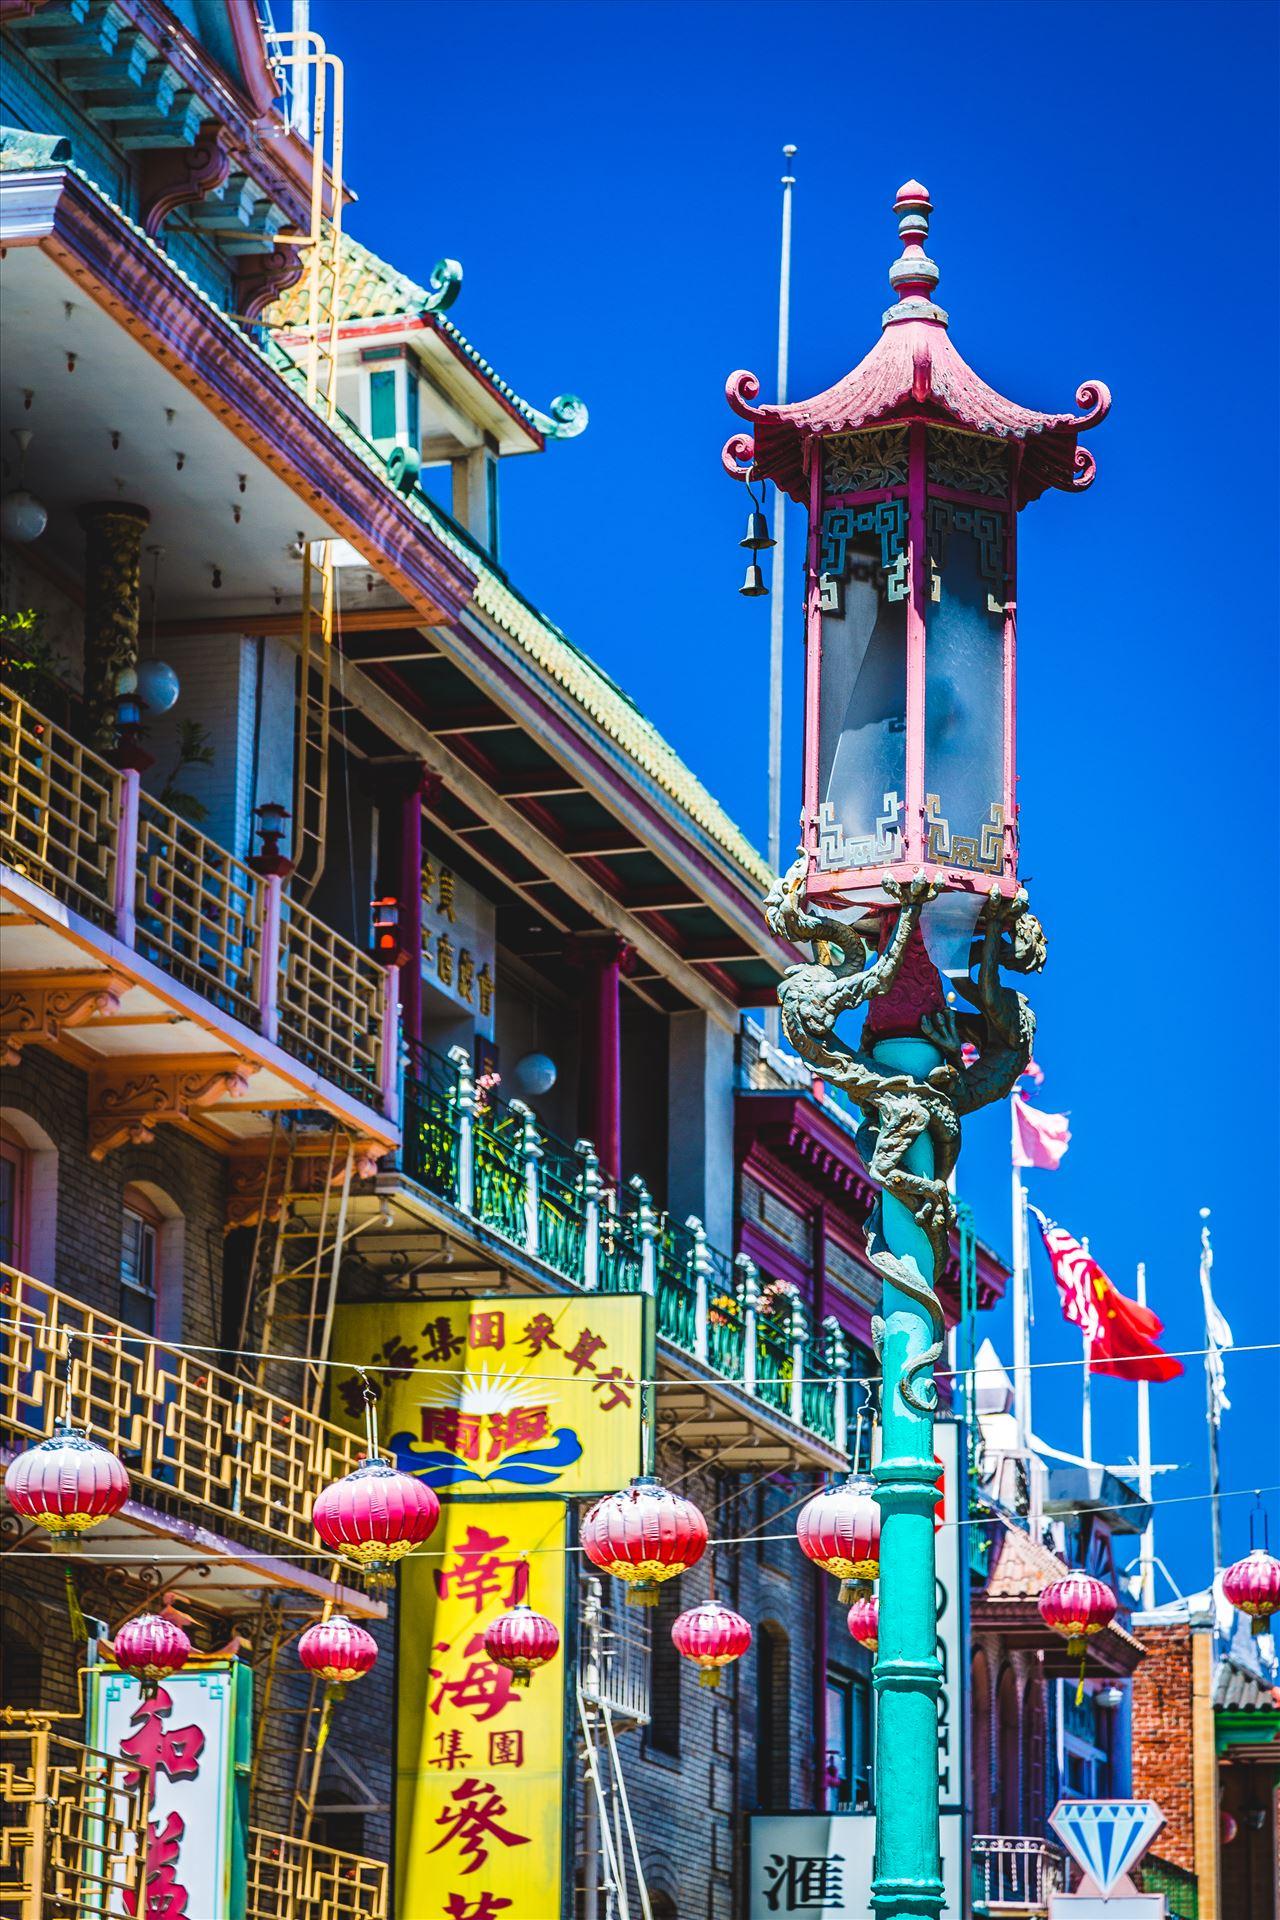 Chinatown -  by D Scott Smith